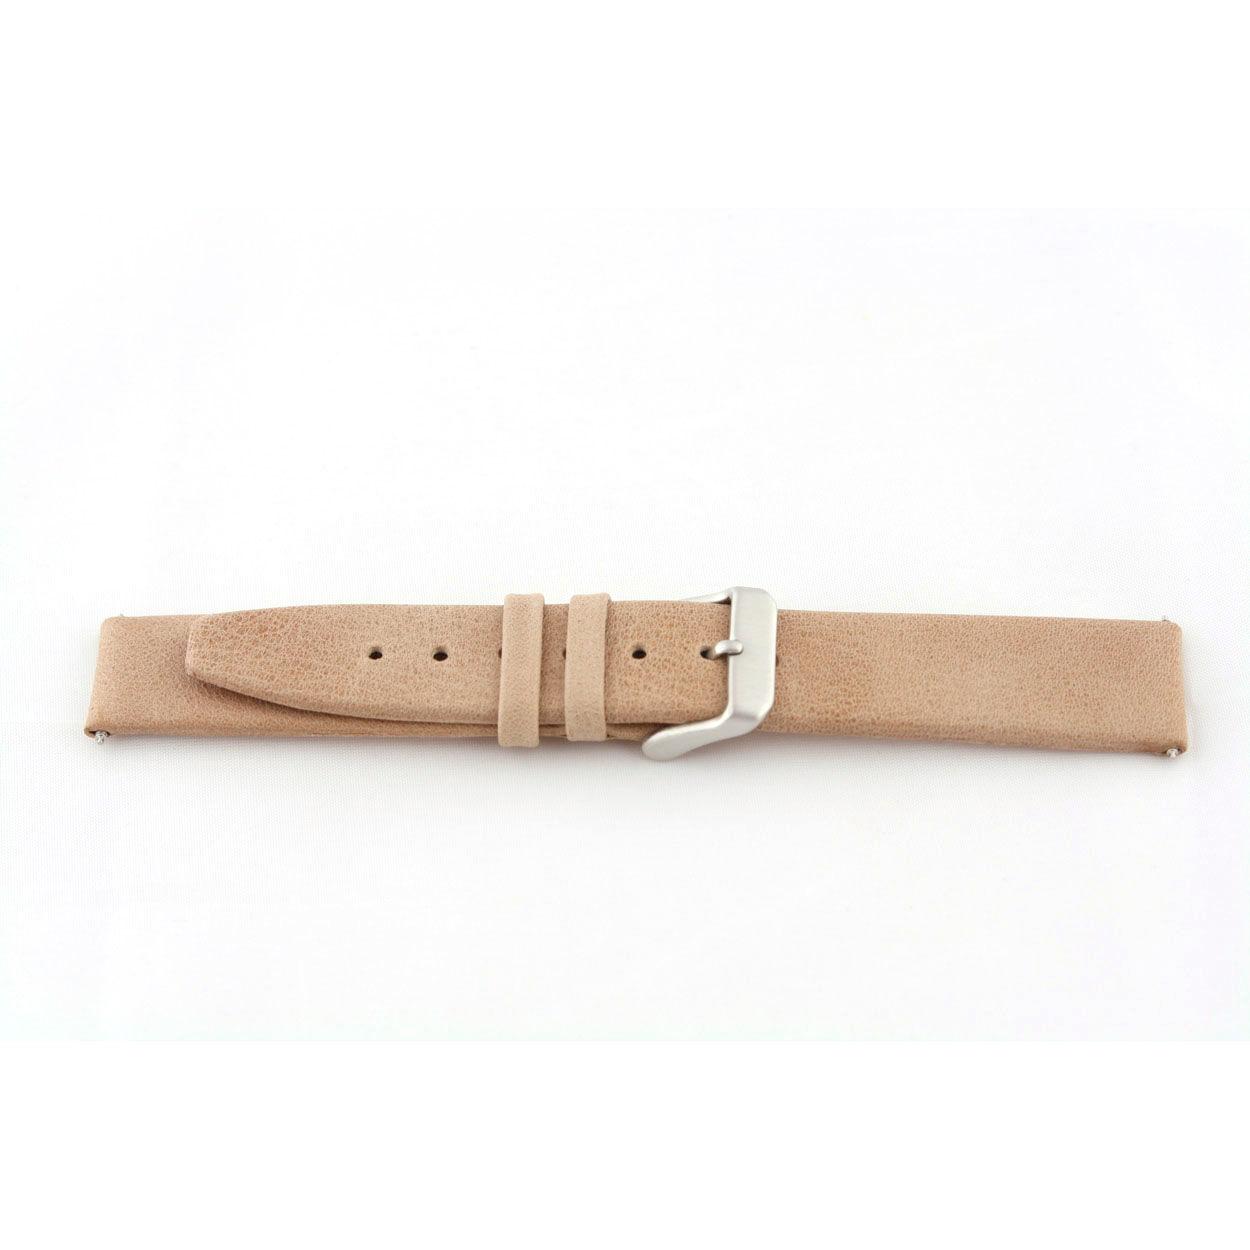 Echt leder horlogeband Beige 24mm G33